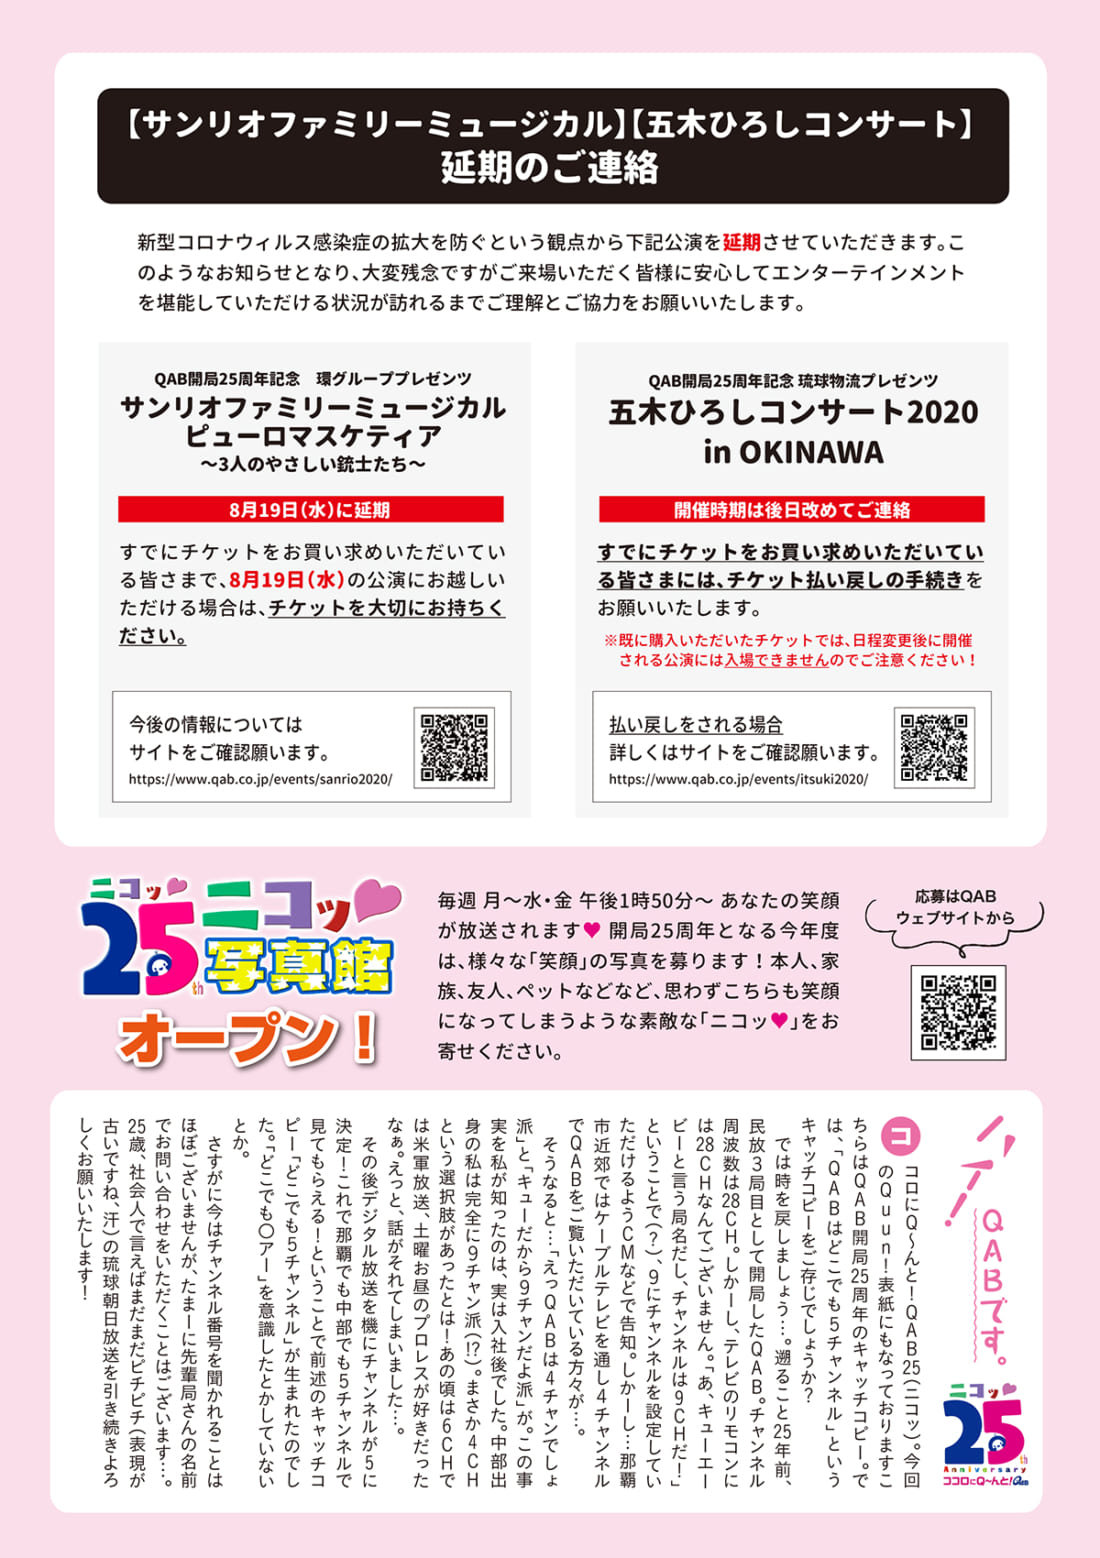 https://www.qab.co.jp/qgoro/wp-content/uploads/quun_1314-1100x1558.jpg